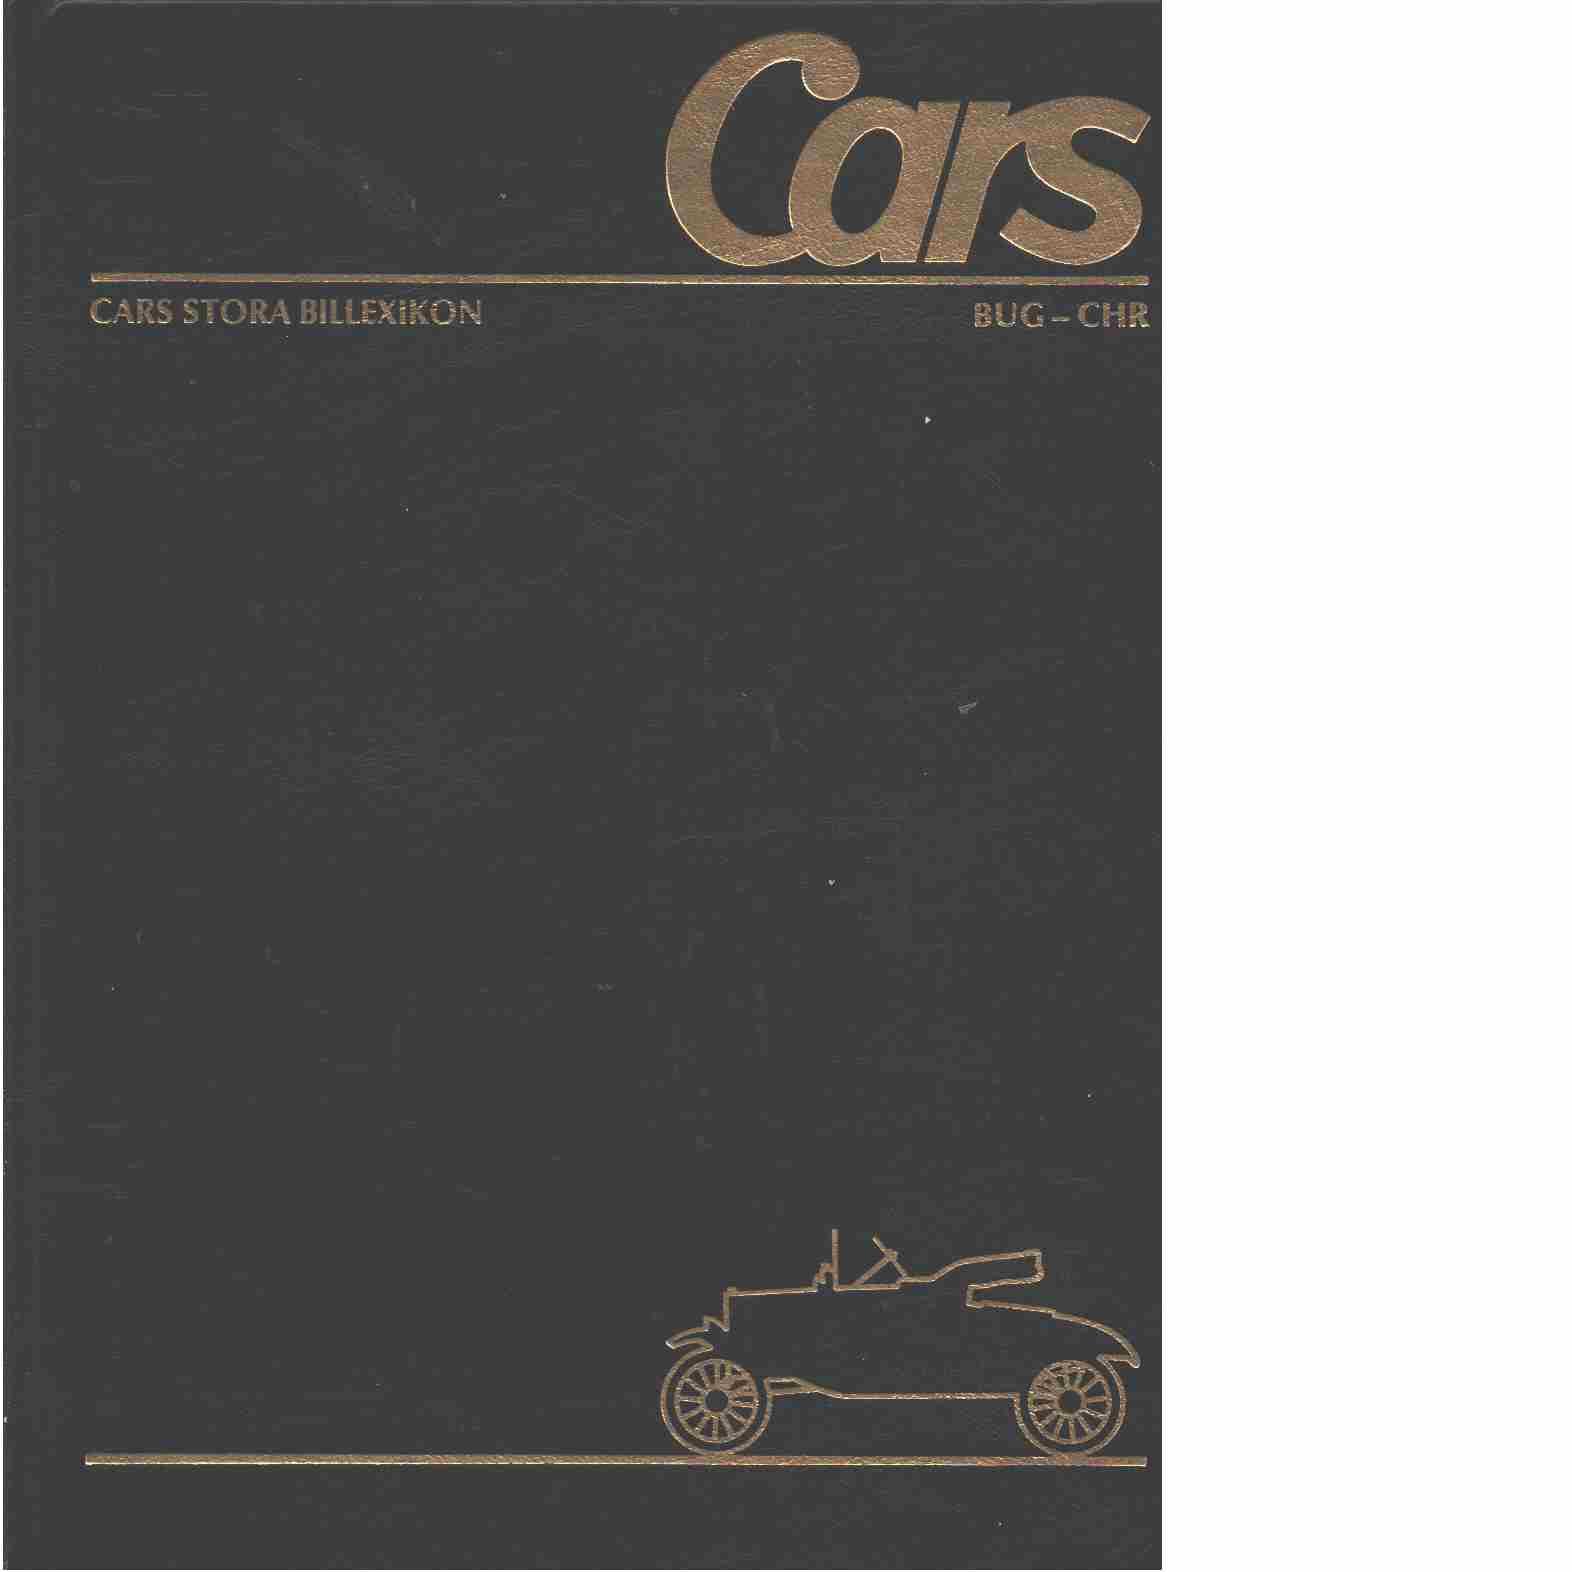 Cars stora billexikon. 7, Bugatti-Gulinelli-Christie - Red.